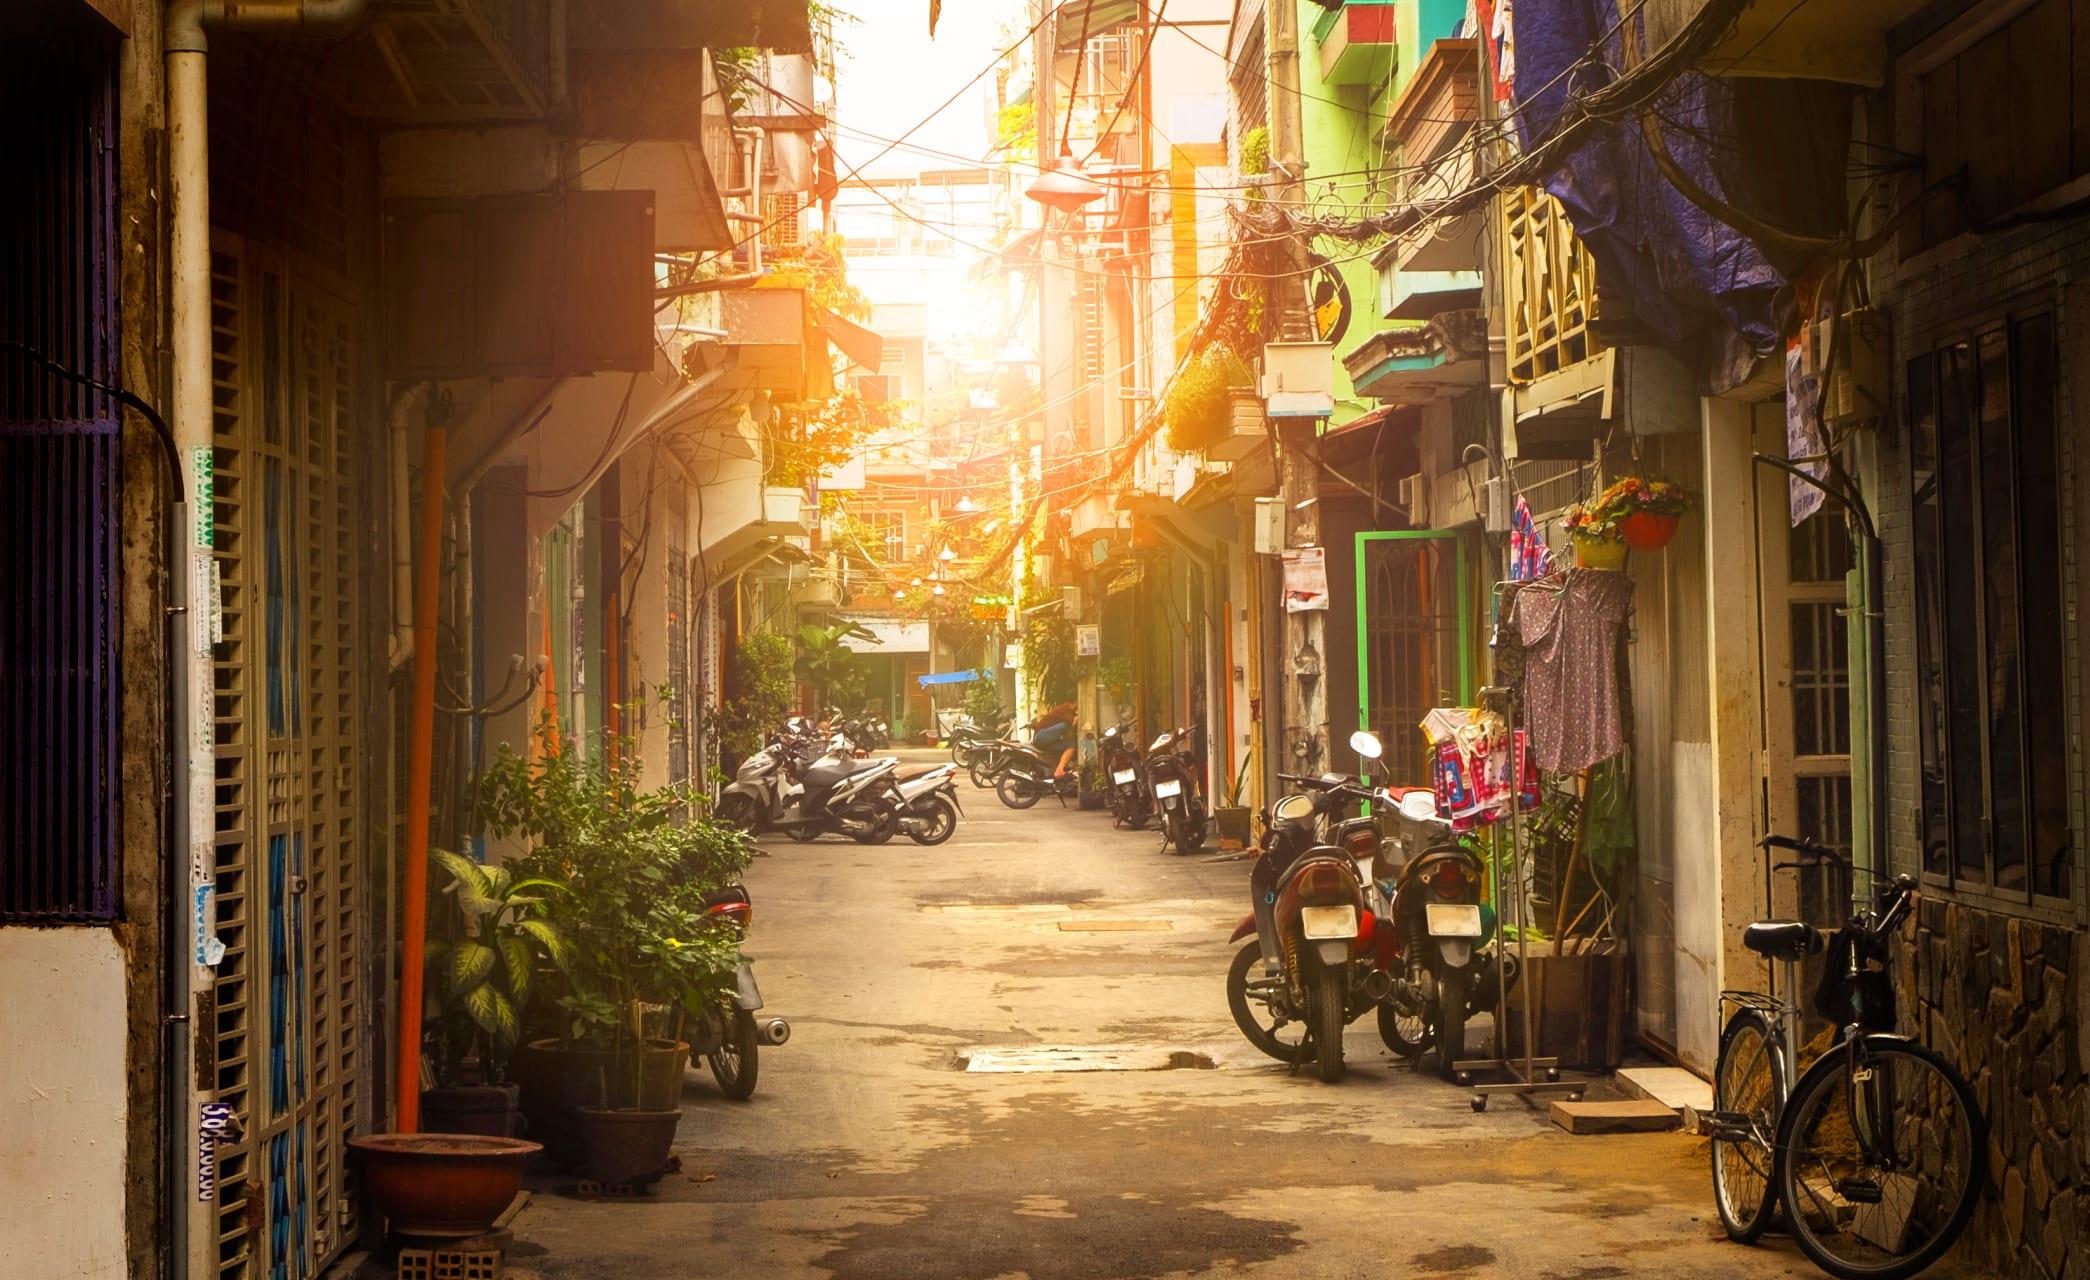 Ho Chi Minh City - Saigon Secret Gems - Day 1: A Bittersweet Ending